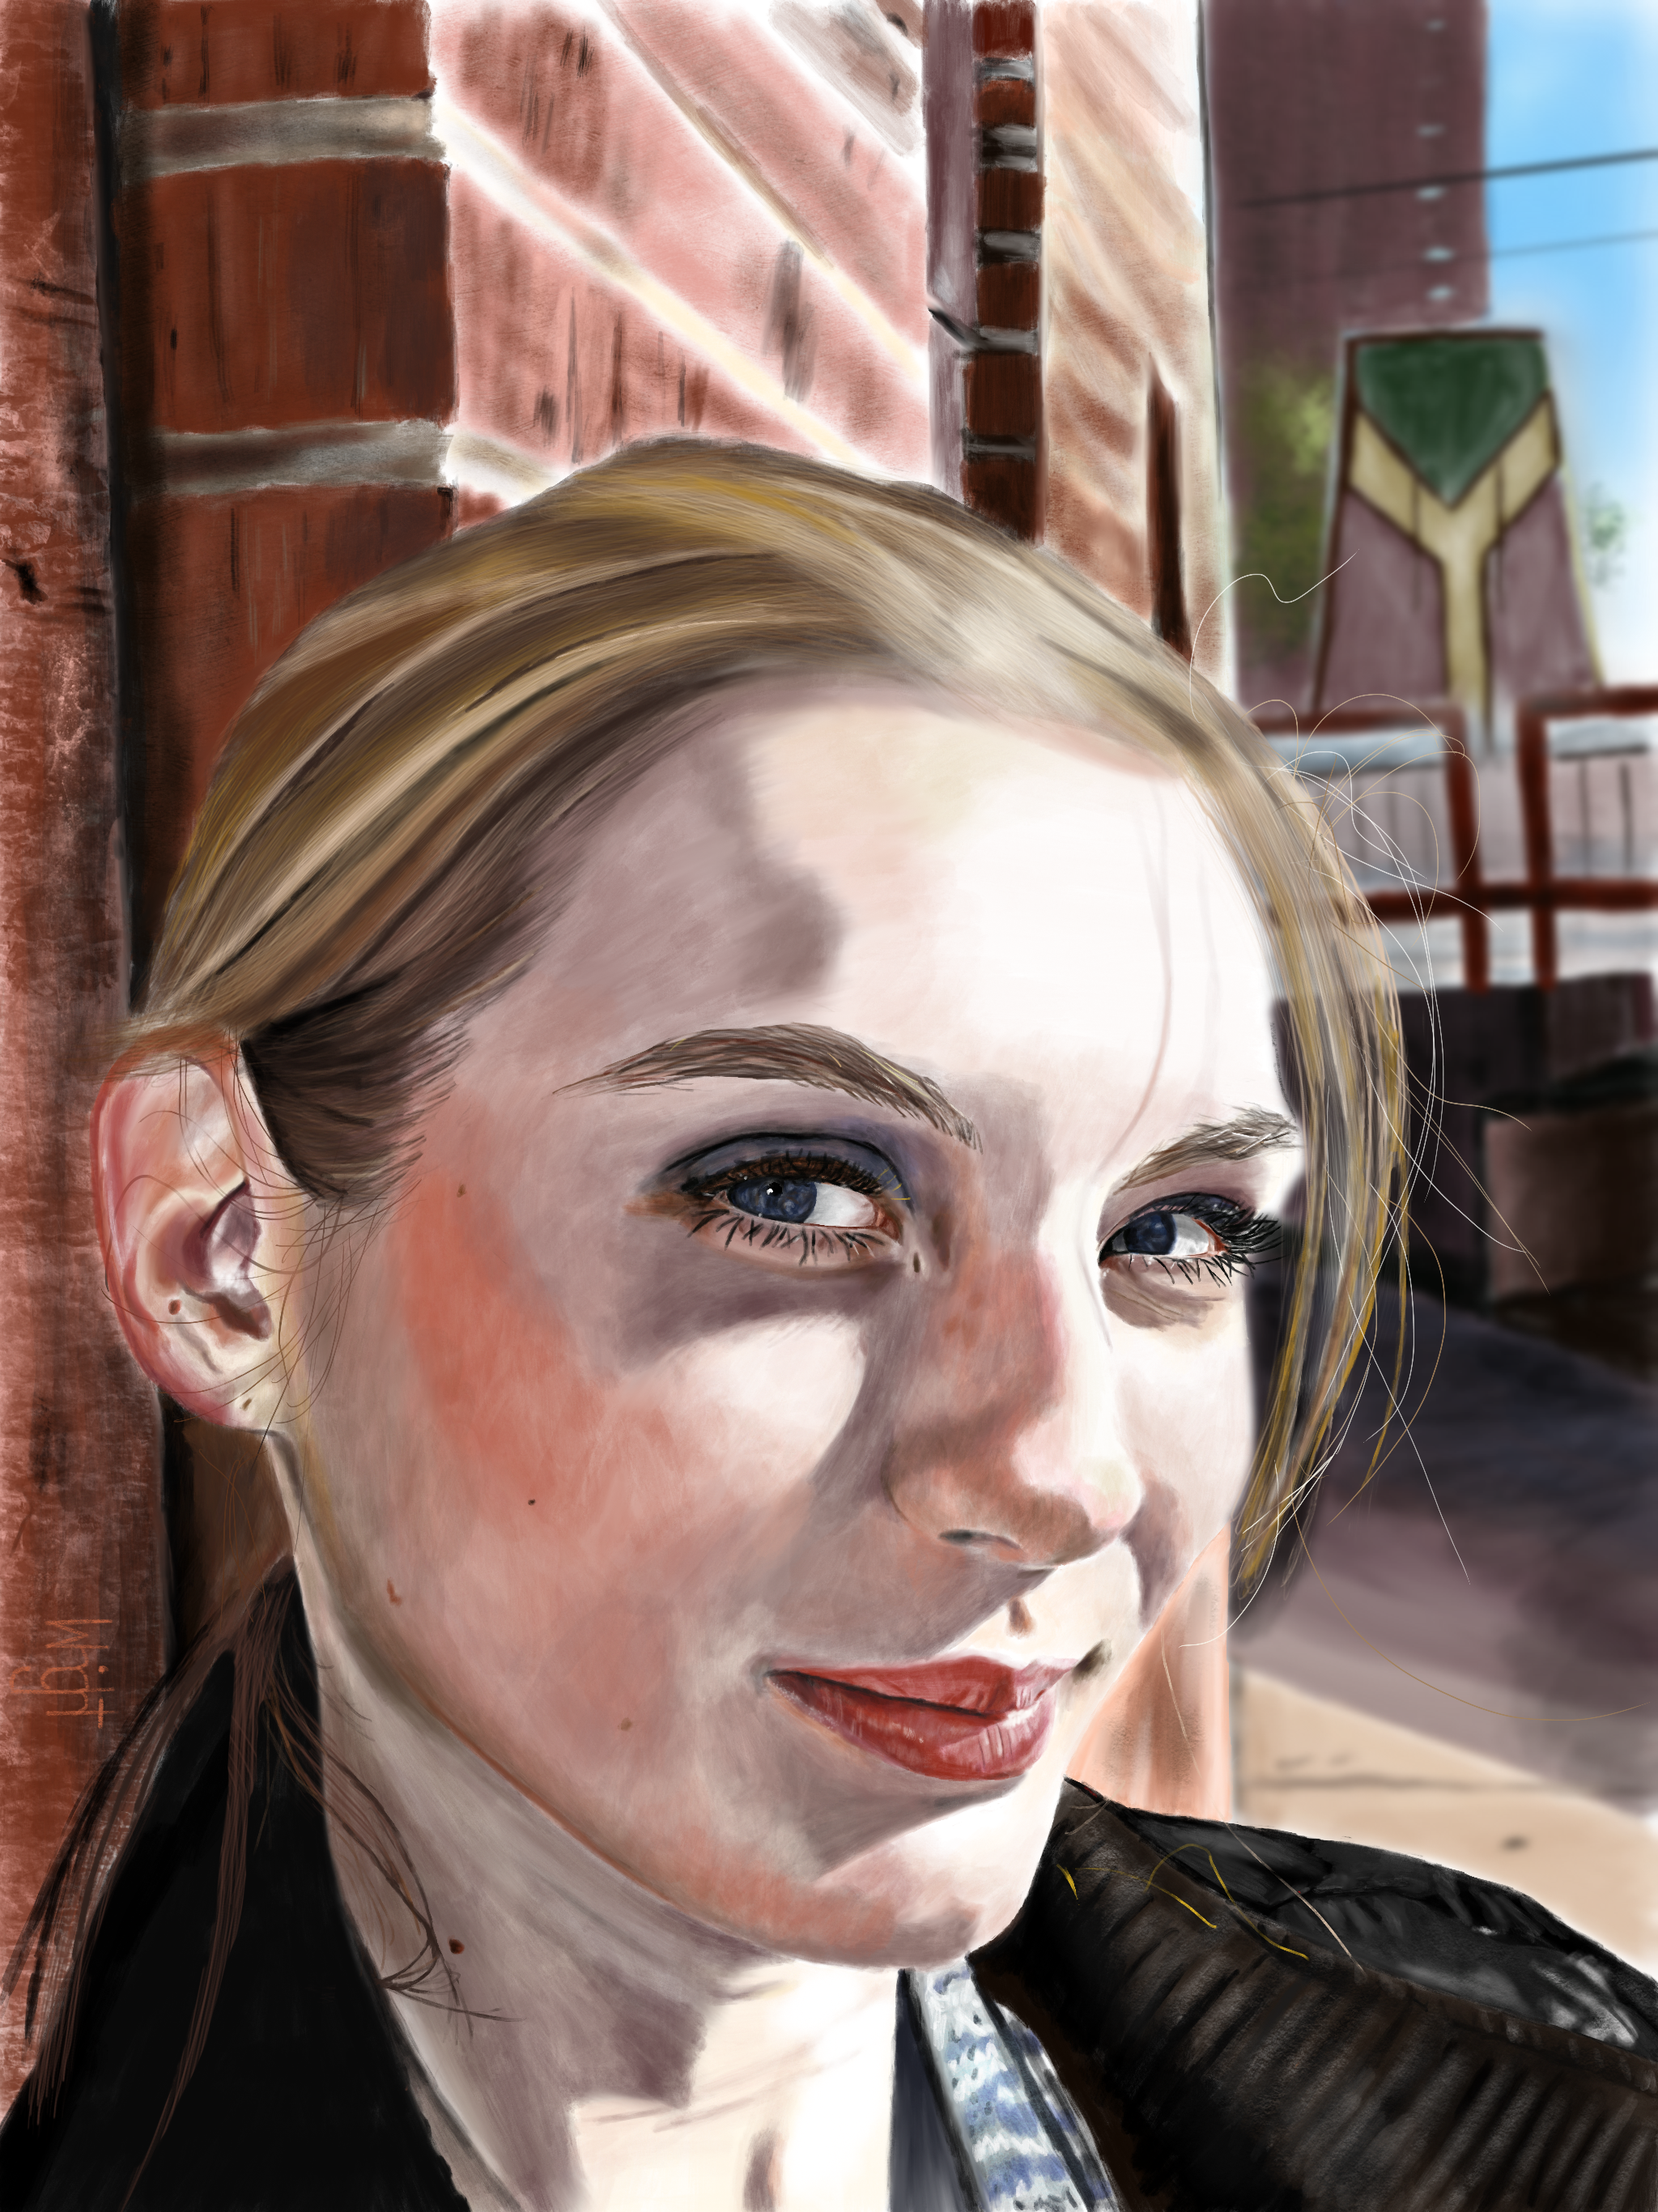 Paige, No. 1